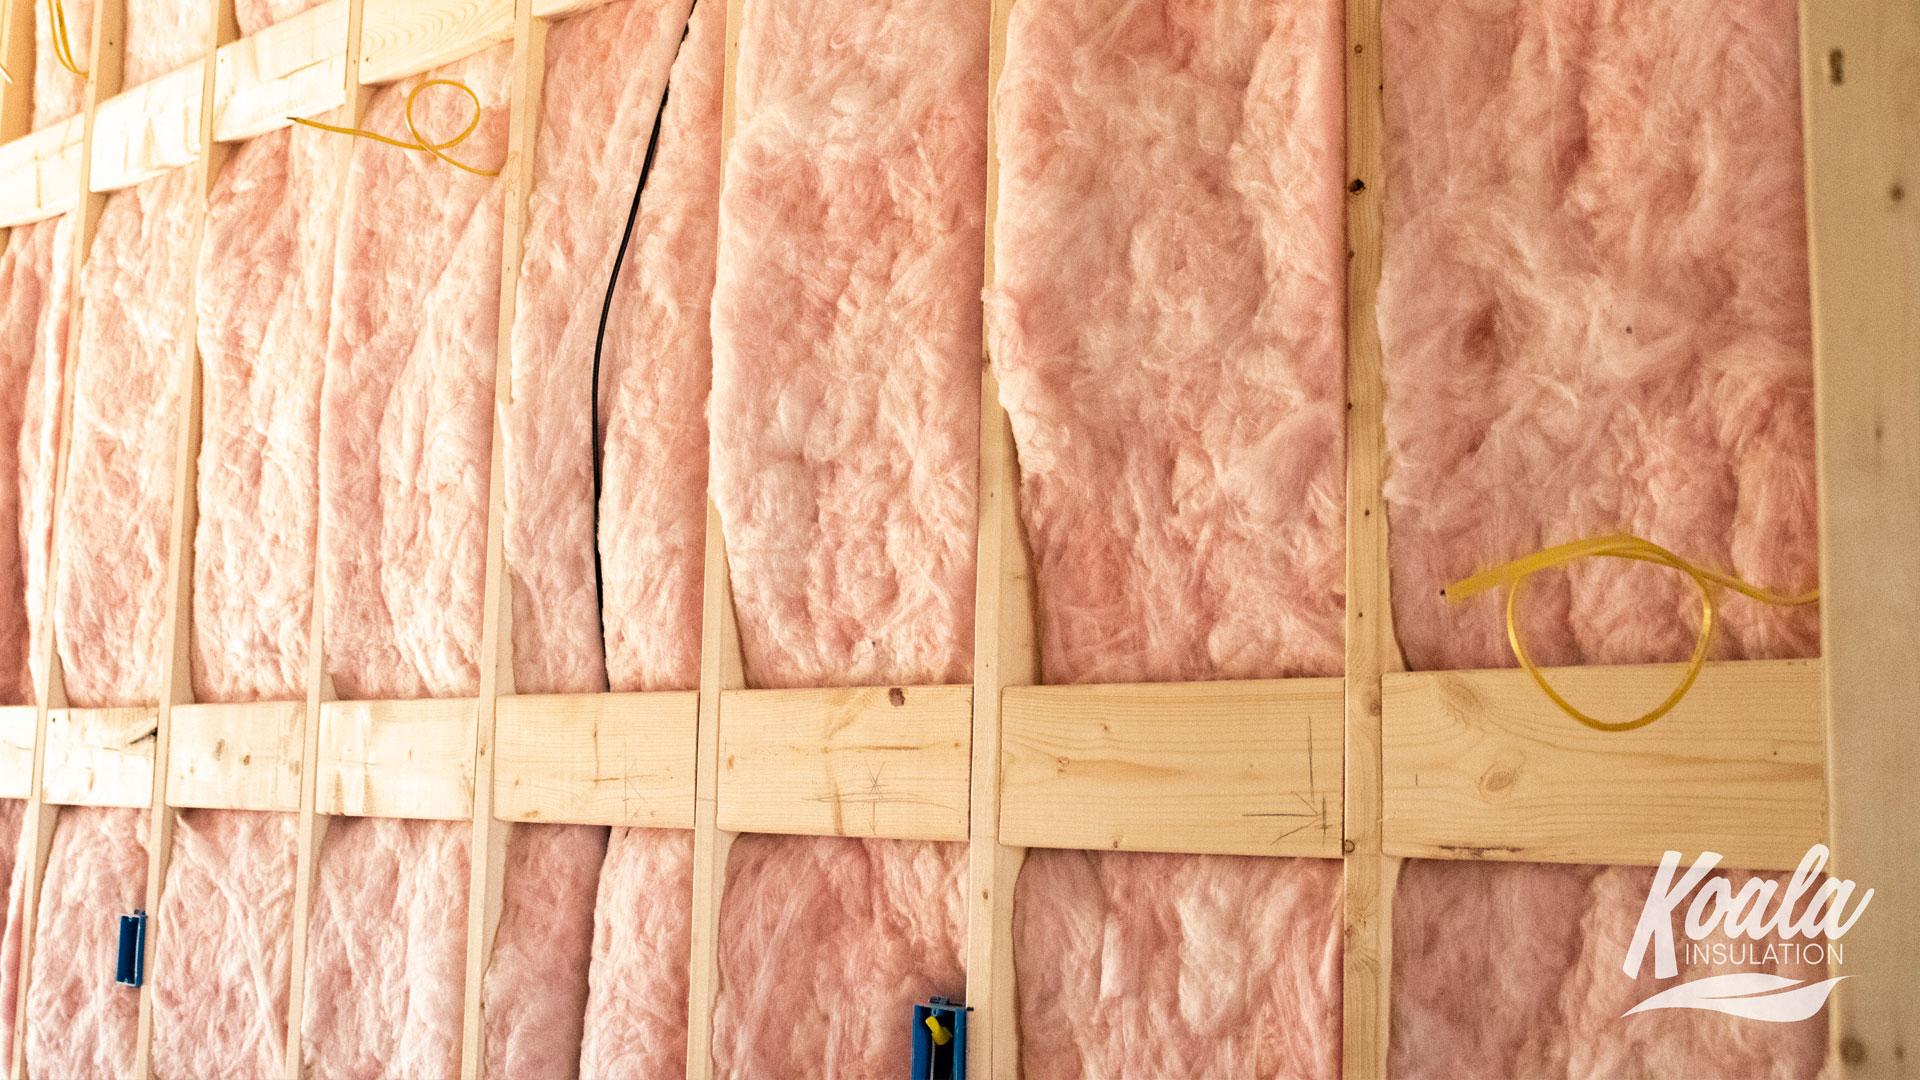 Let-Koala-Handle-your-batt-insulation-project!